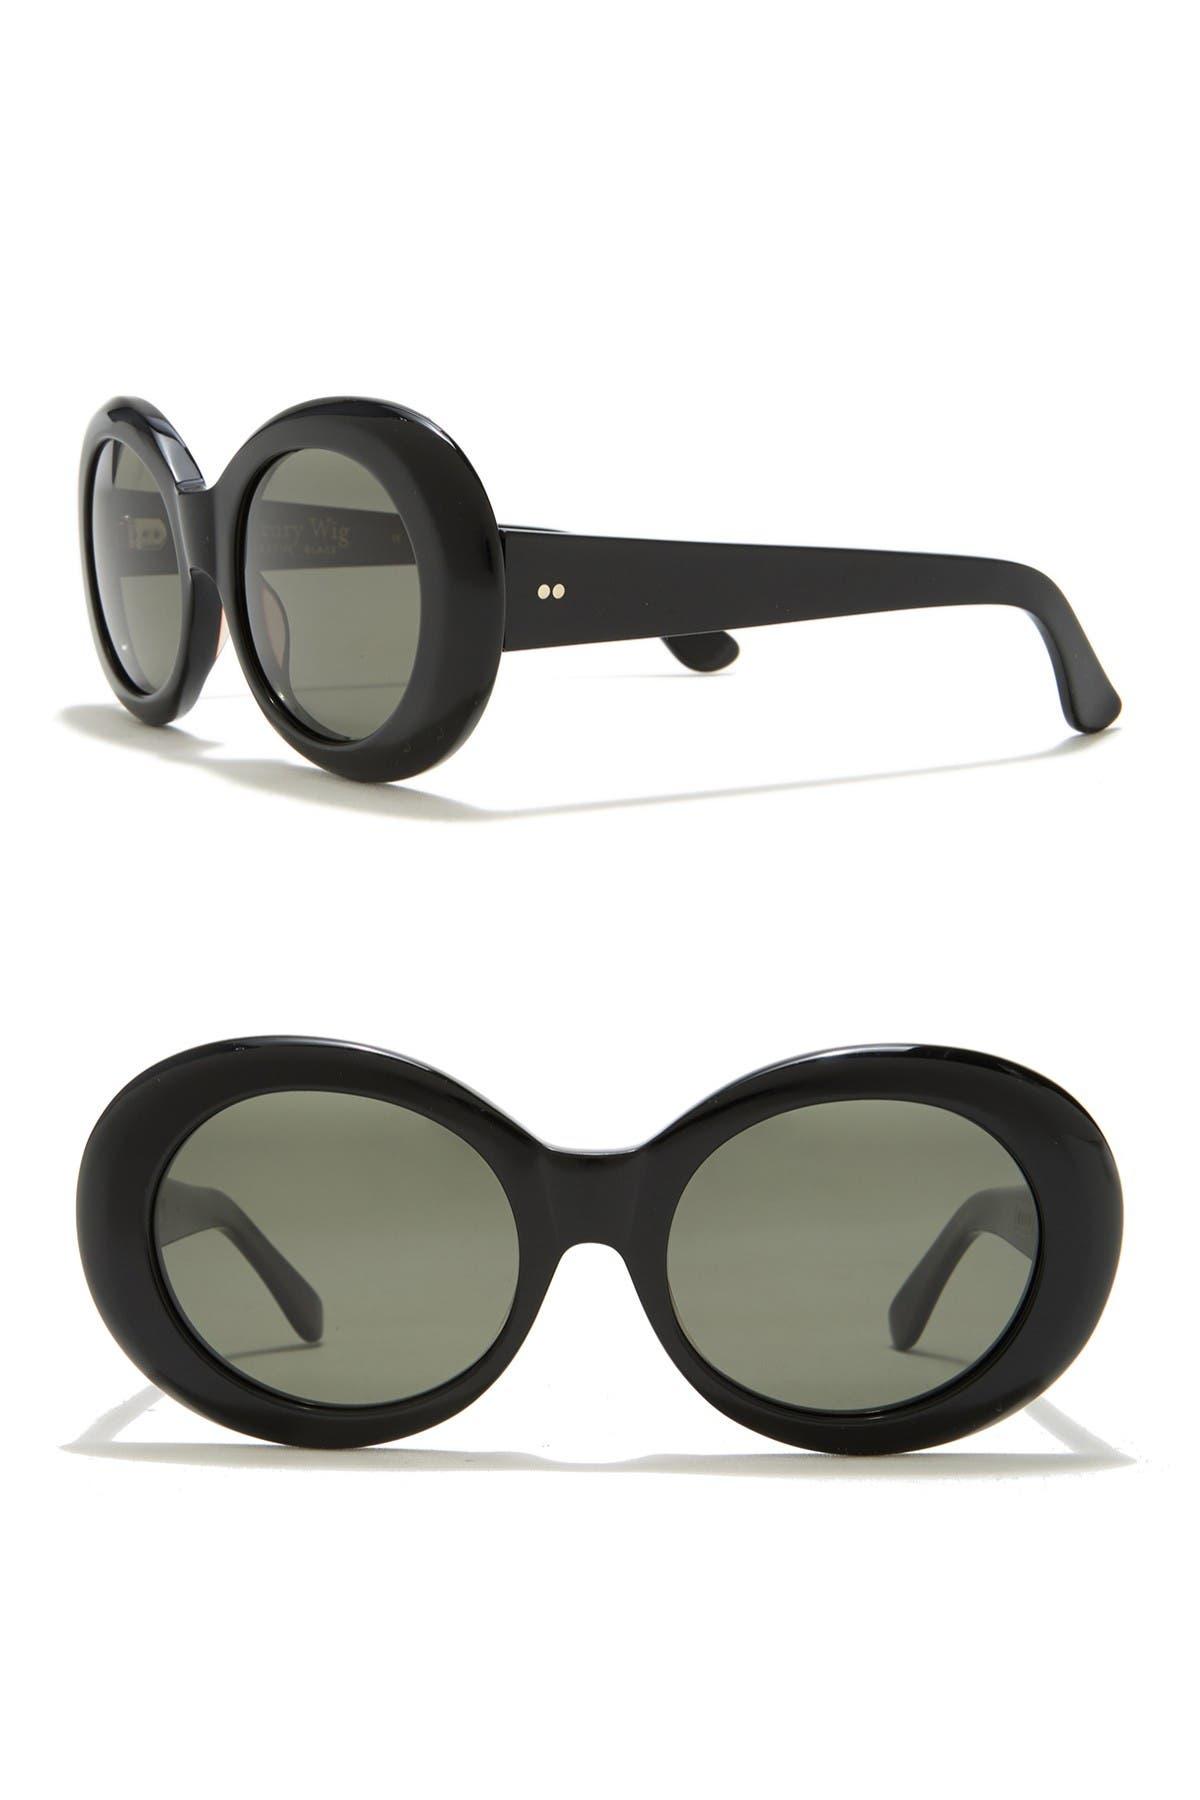 Image of RAEN Figurative 51mm Oval Sunglasses